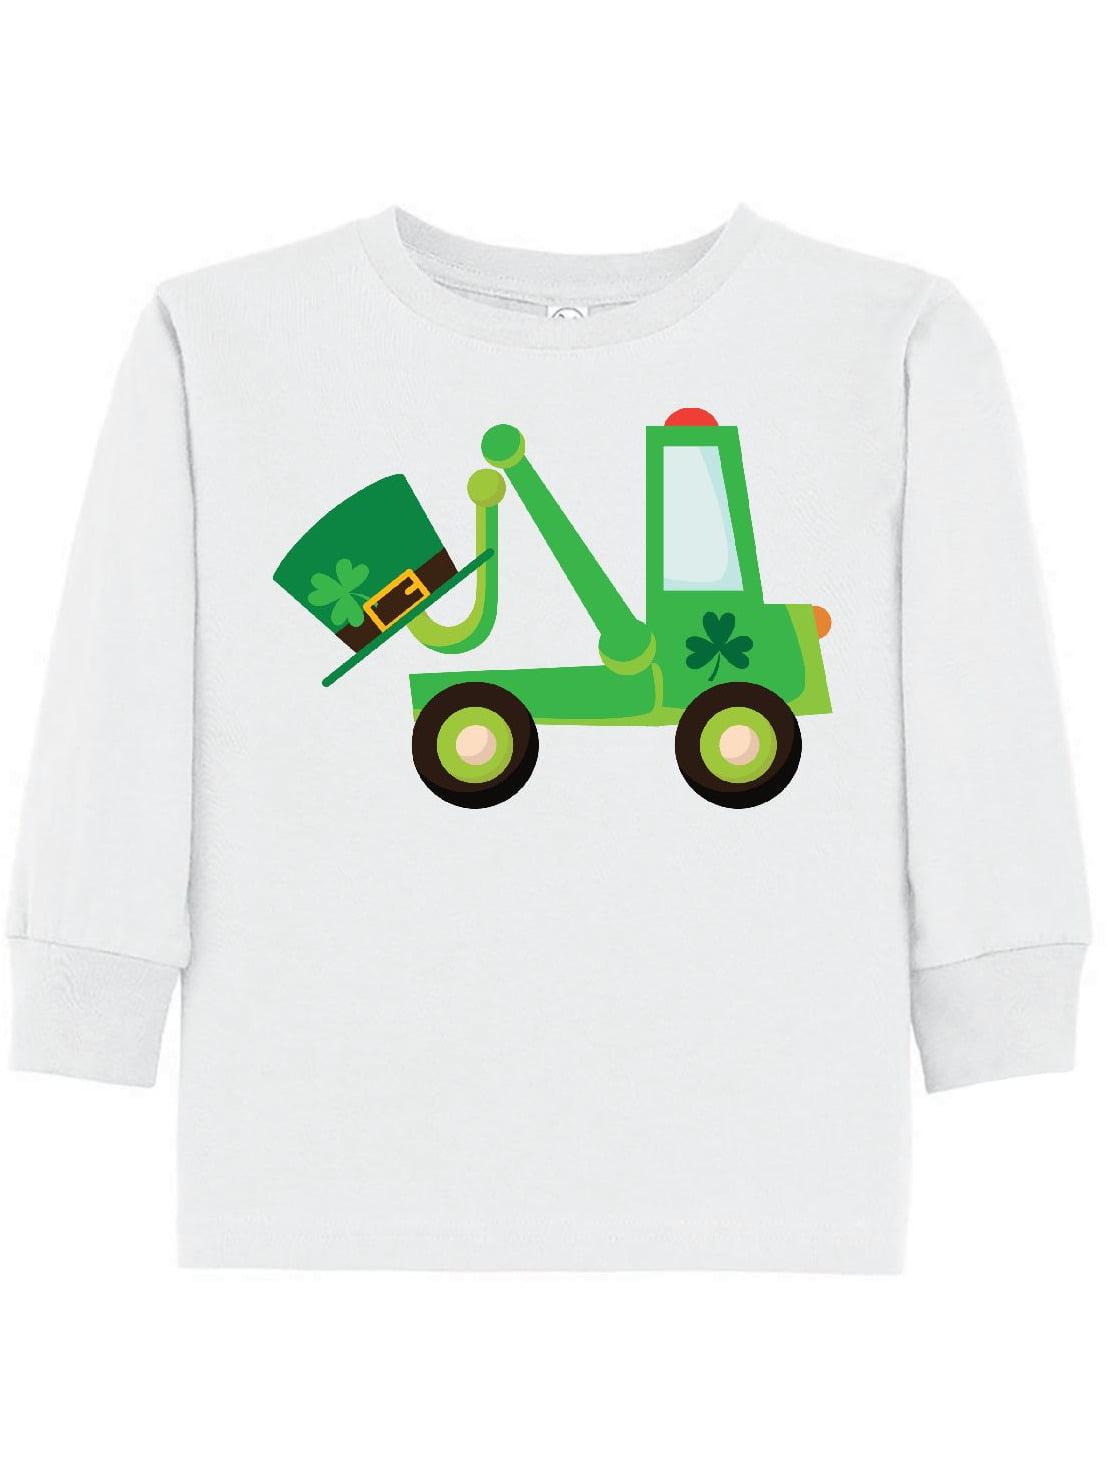 St Patricks Tow Truck Toddler Long Sleeve T-Shirt